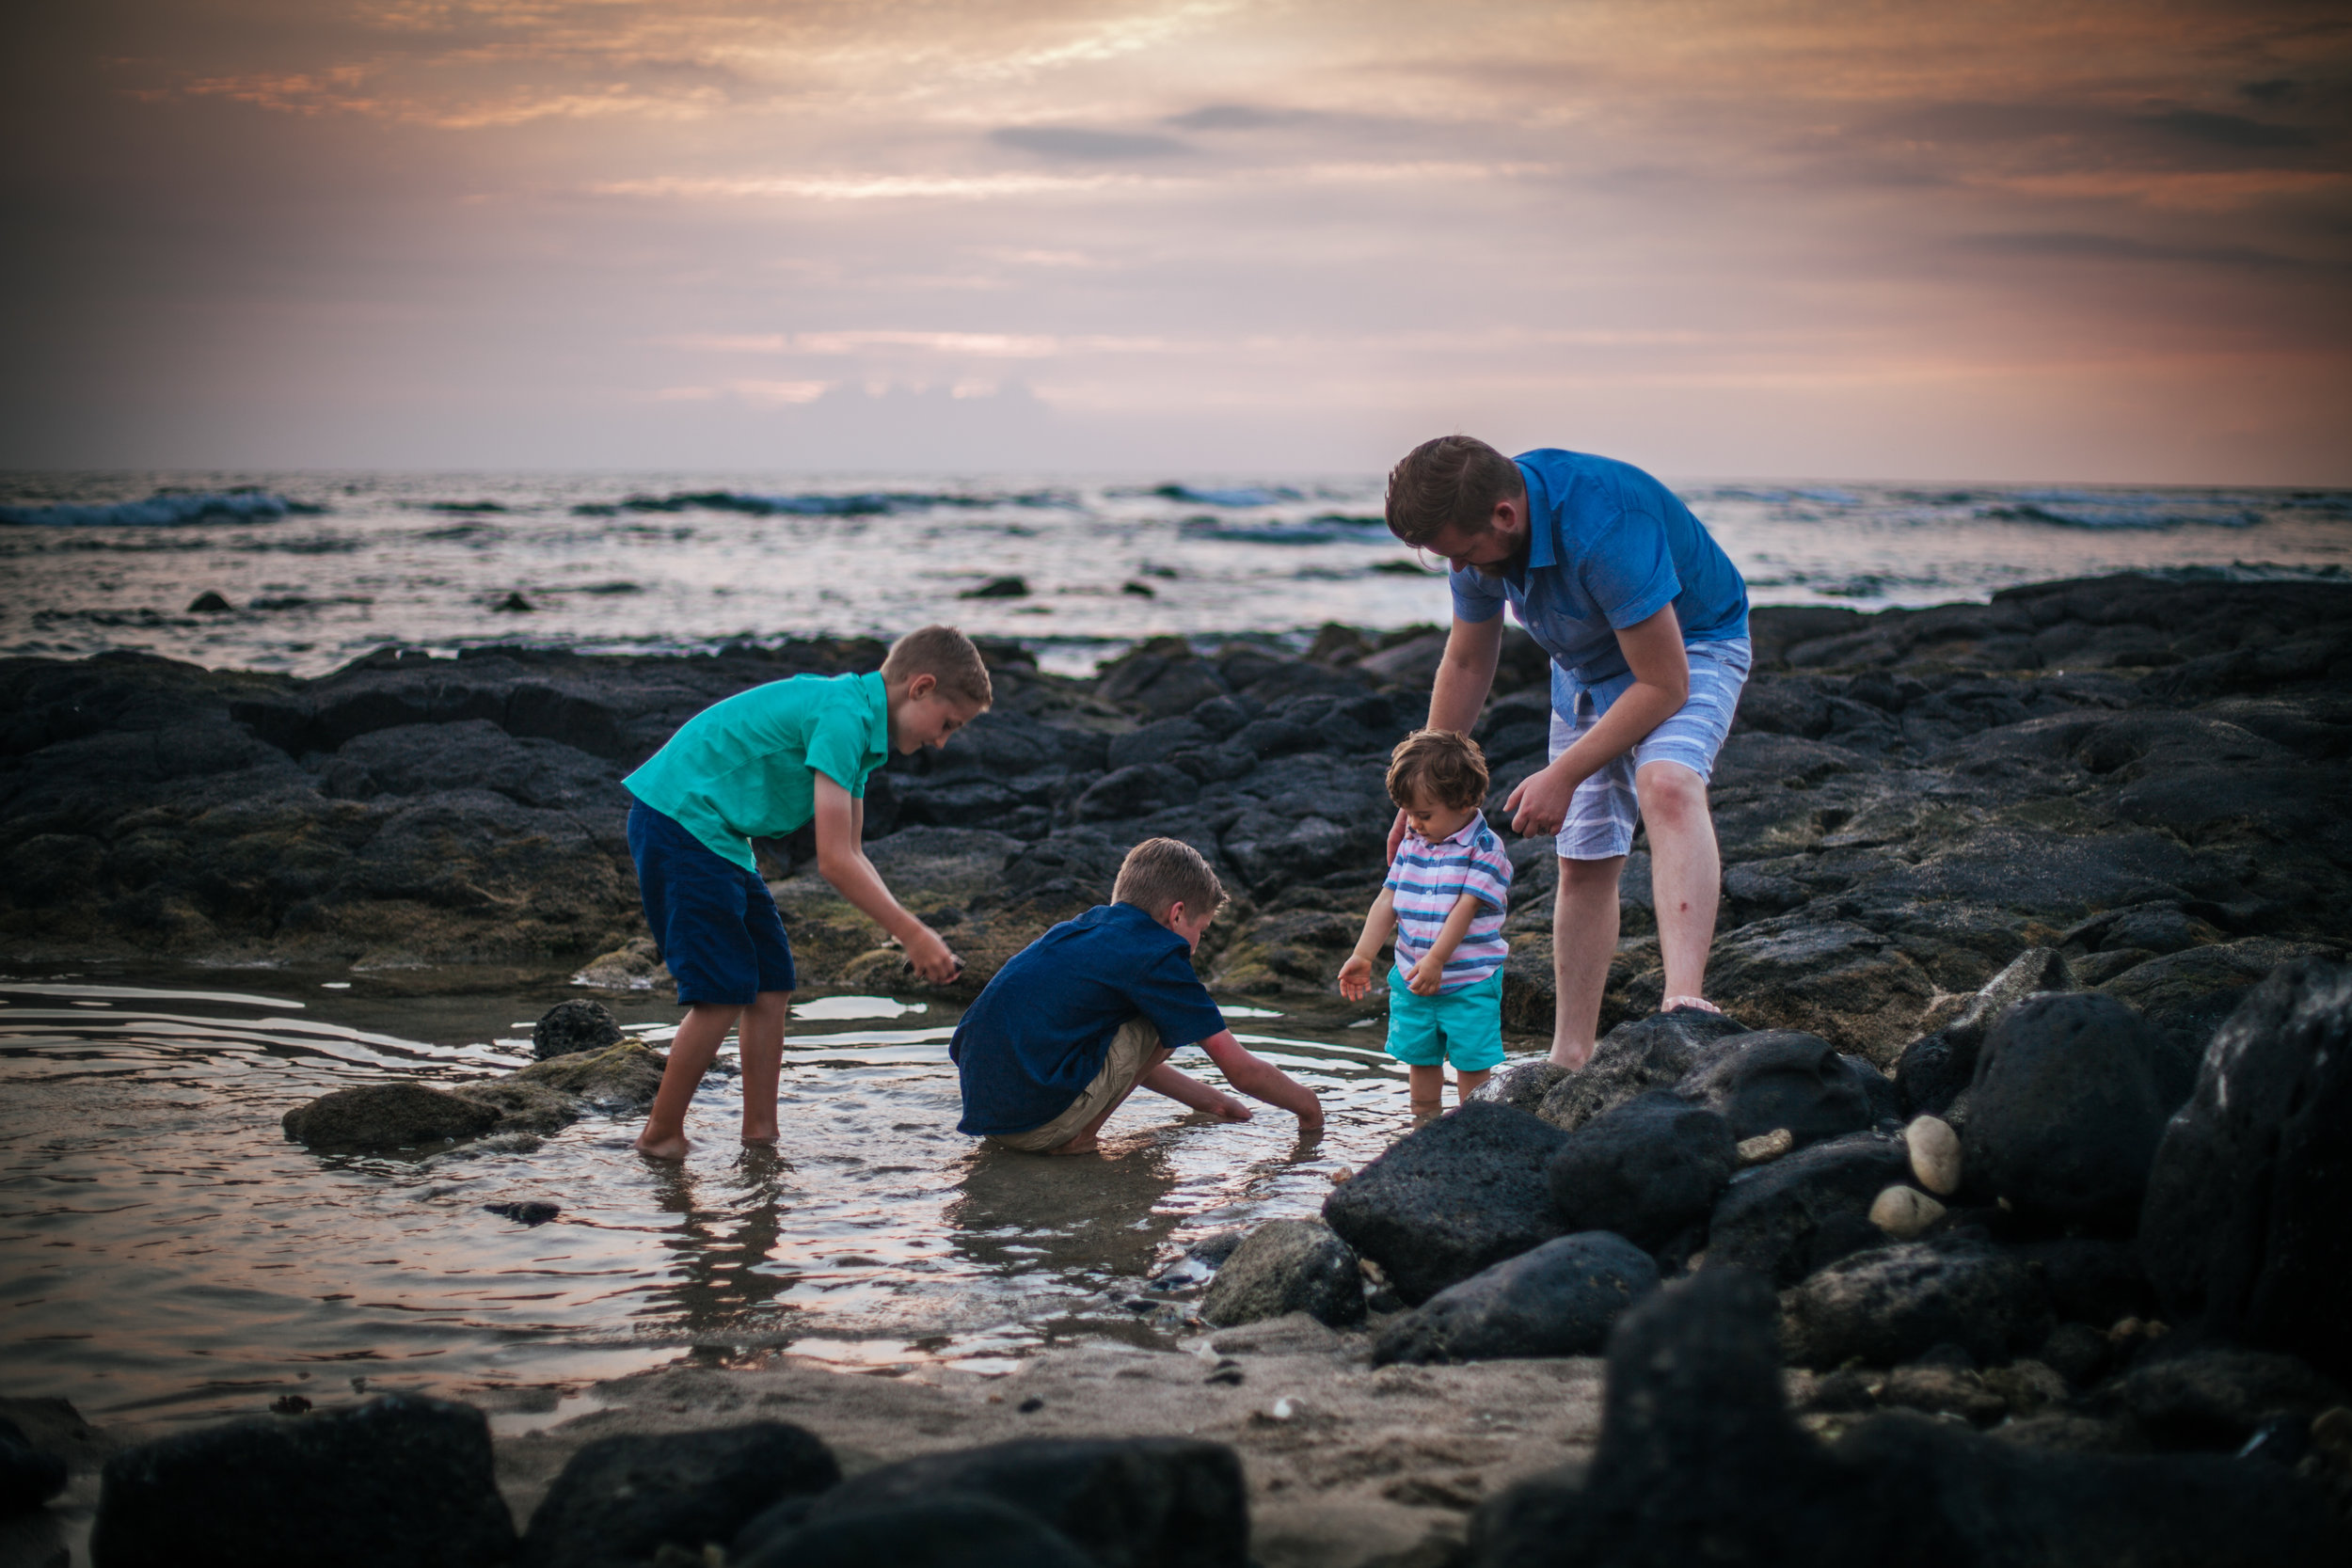 big island hawaii old kona airport beach family © kelilina photography 20170221182613.jpg